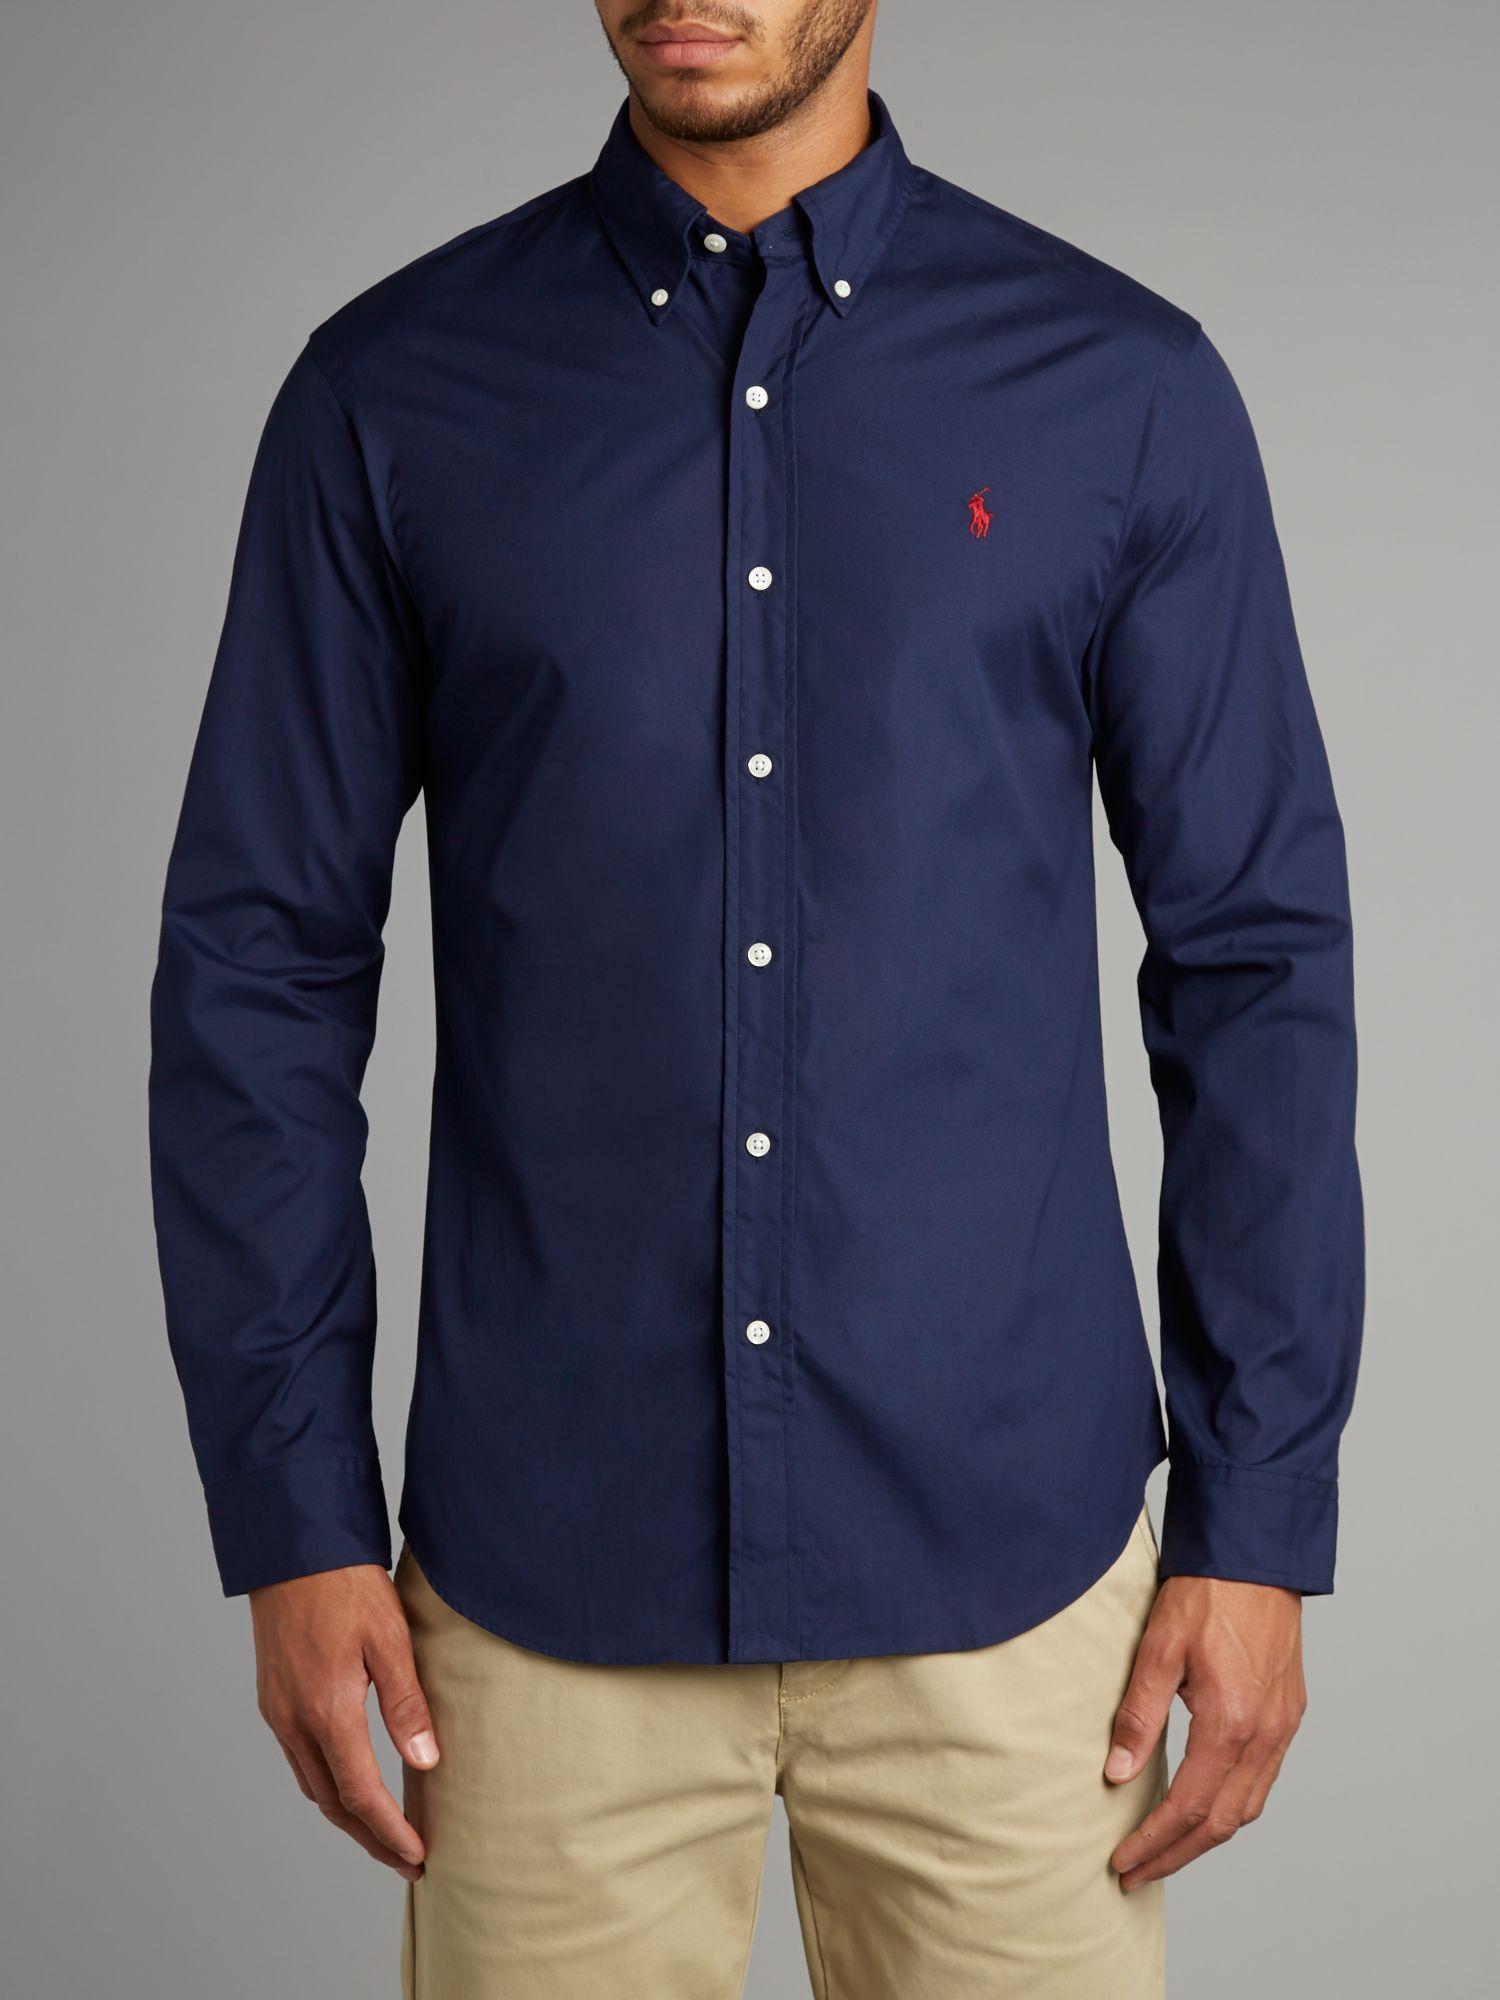 Polo Ralph Lauren Classic Long Sleeve Slim Fit Shirt In